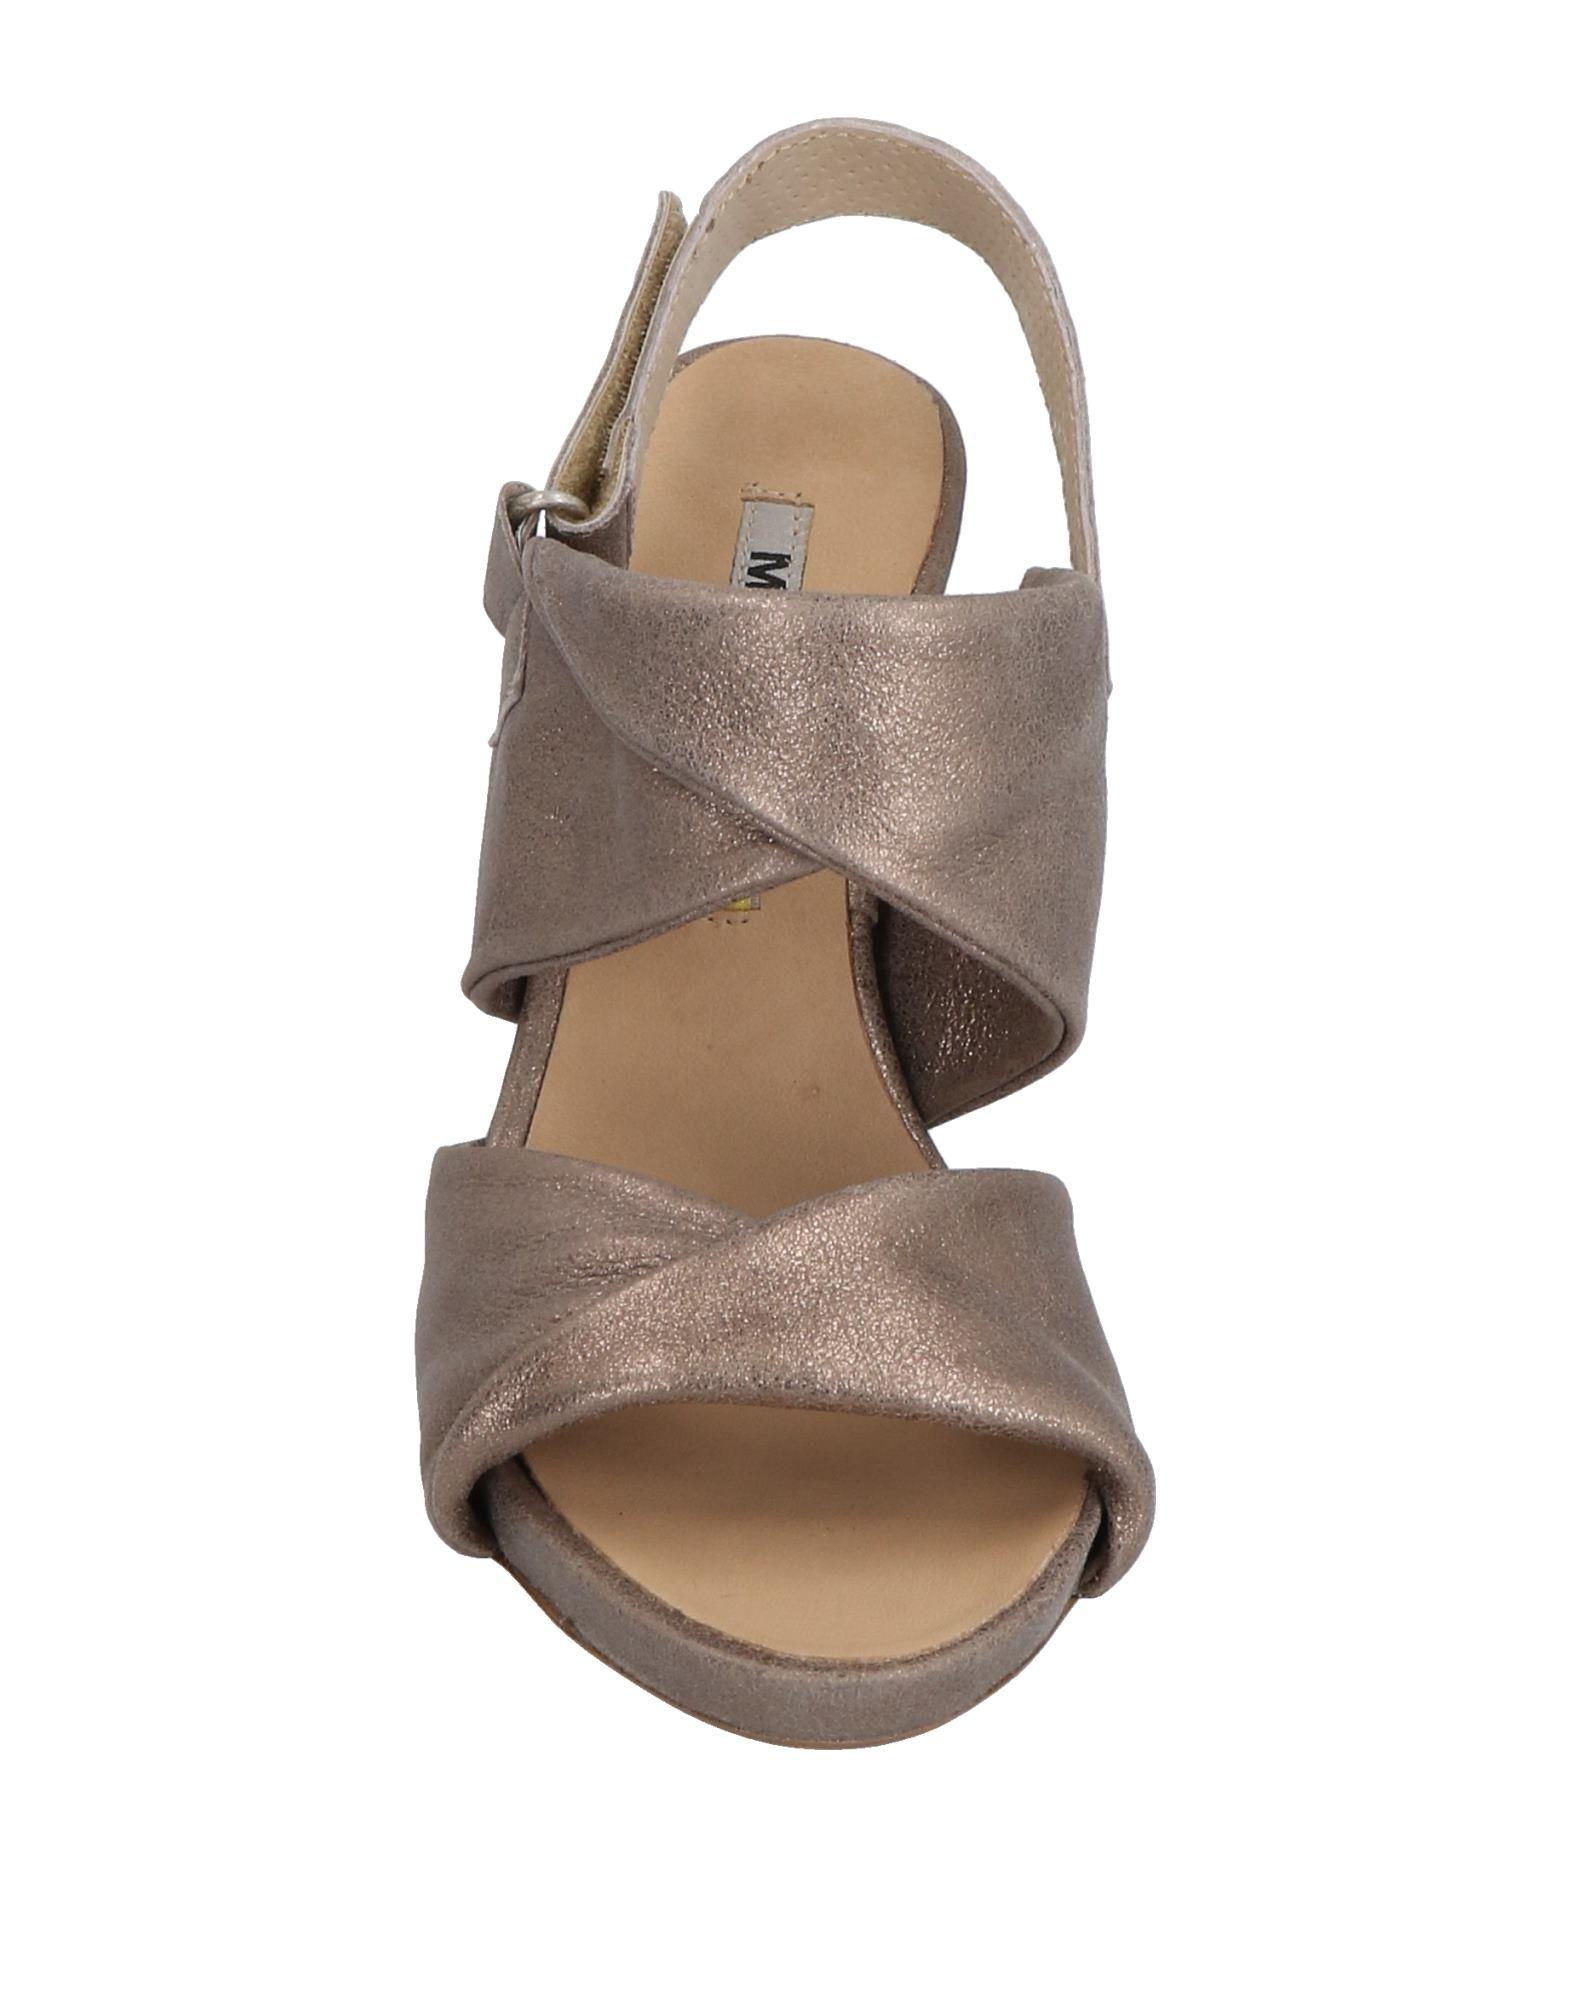 manas sandales - femmes manas sandales canada en ligne sur canada sandales - 11493981nl b38c21